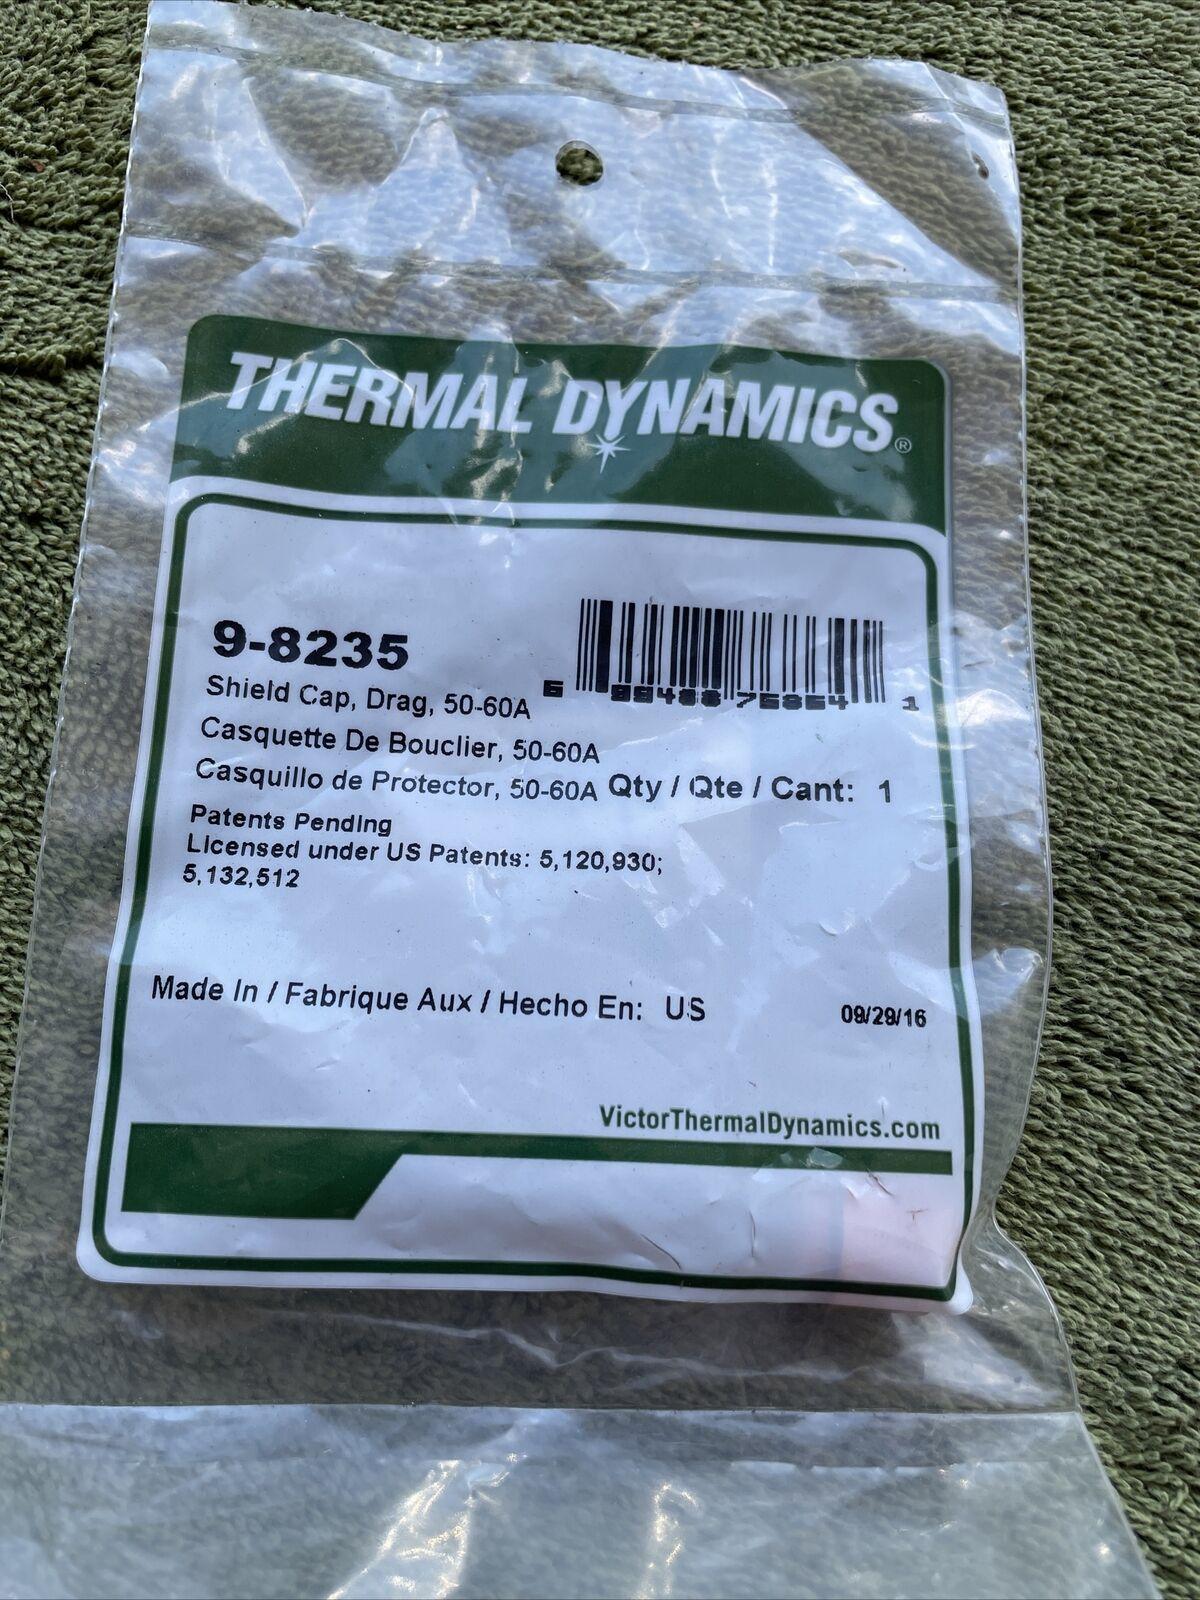 5pcs 9-8235 Fits Thermal Dynamics SL60//SL100 Shield Cap ....From USA.....